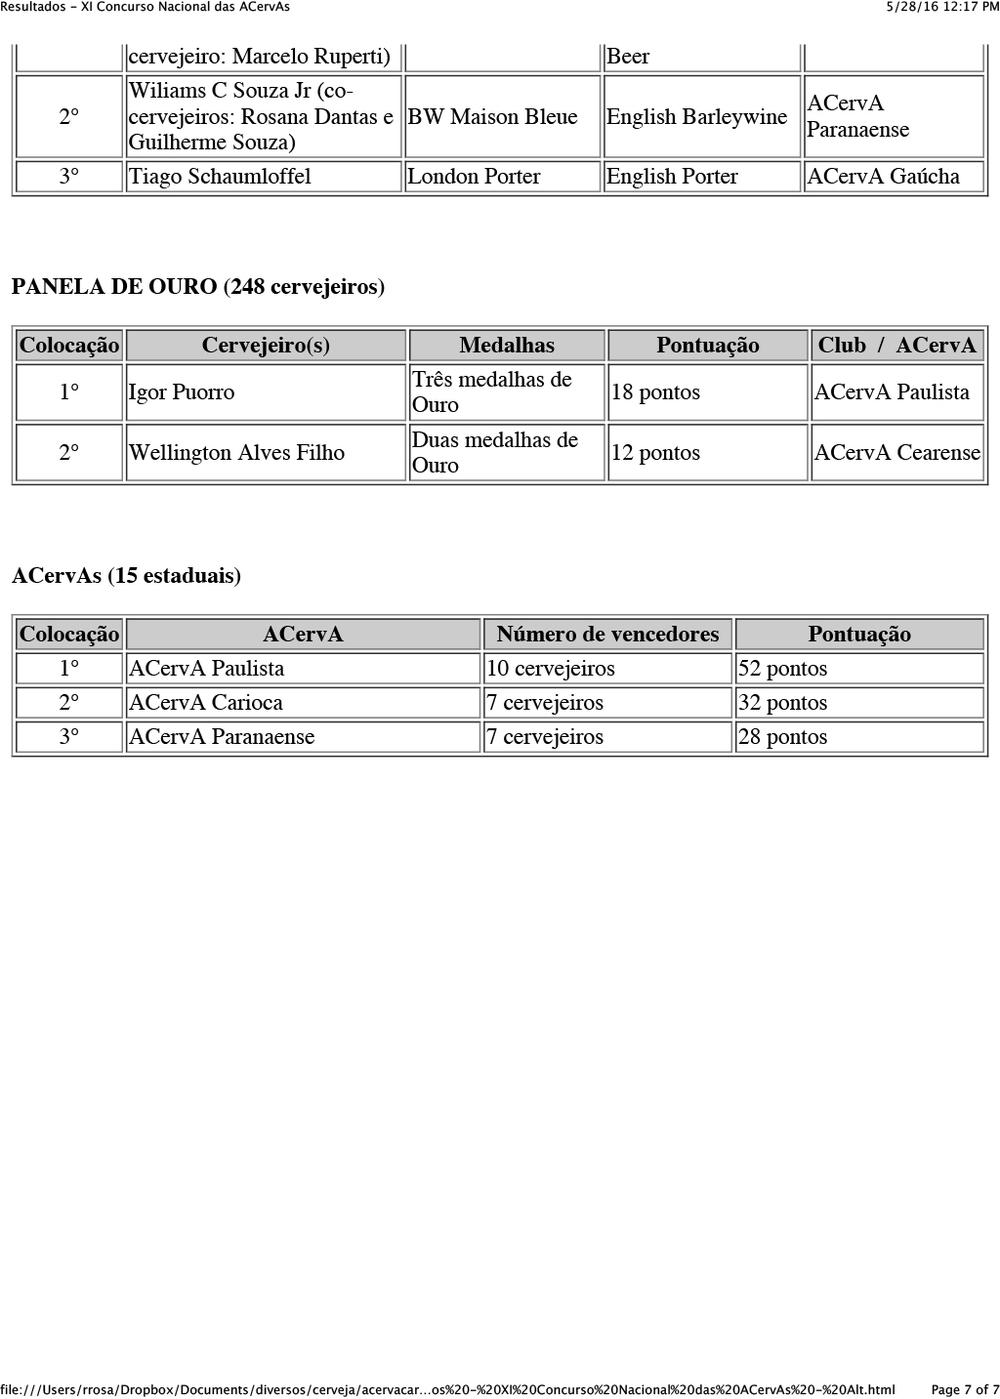 Resultados - XI Concurso Nacional das ACervAs